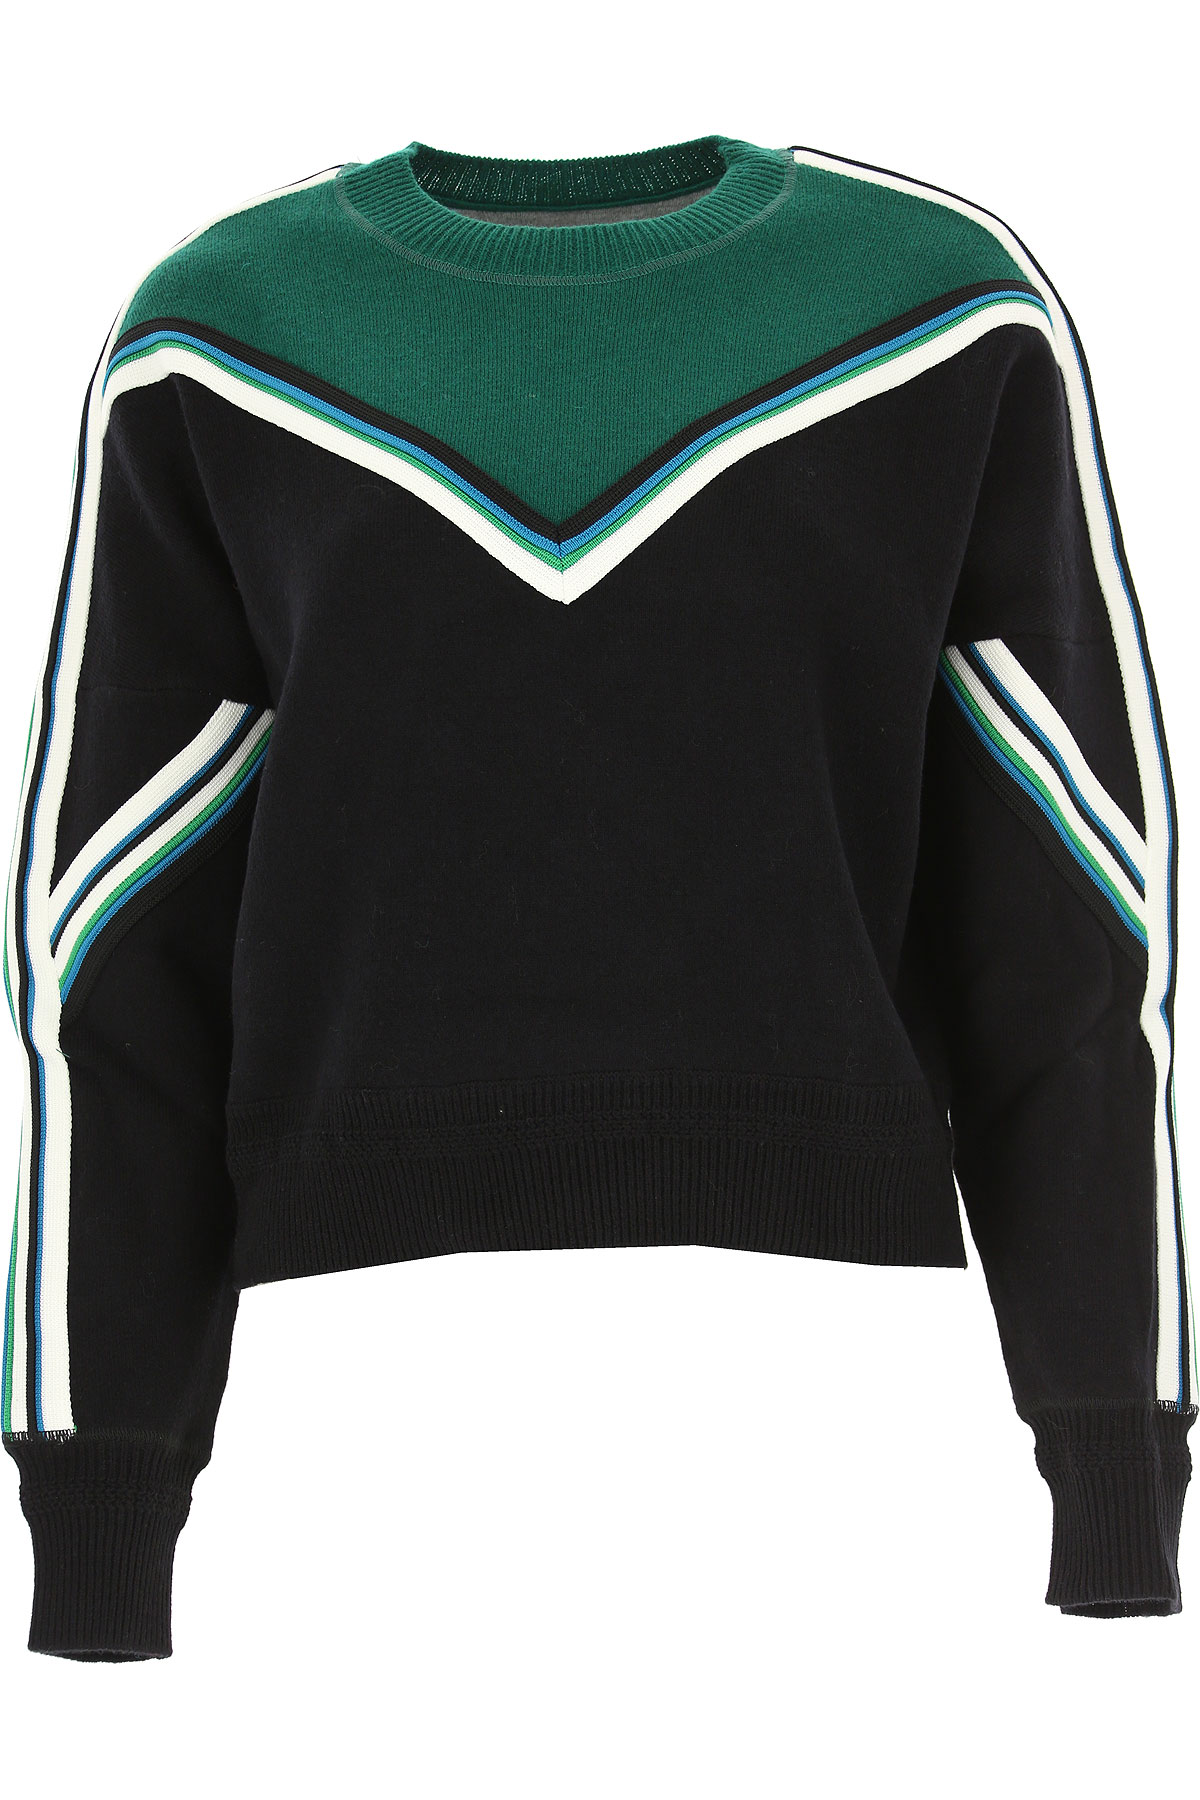 Isabel Marant Sweater for Women Jumper, Black, polyamide, 2017, 2 4 6 USA-478233